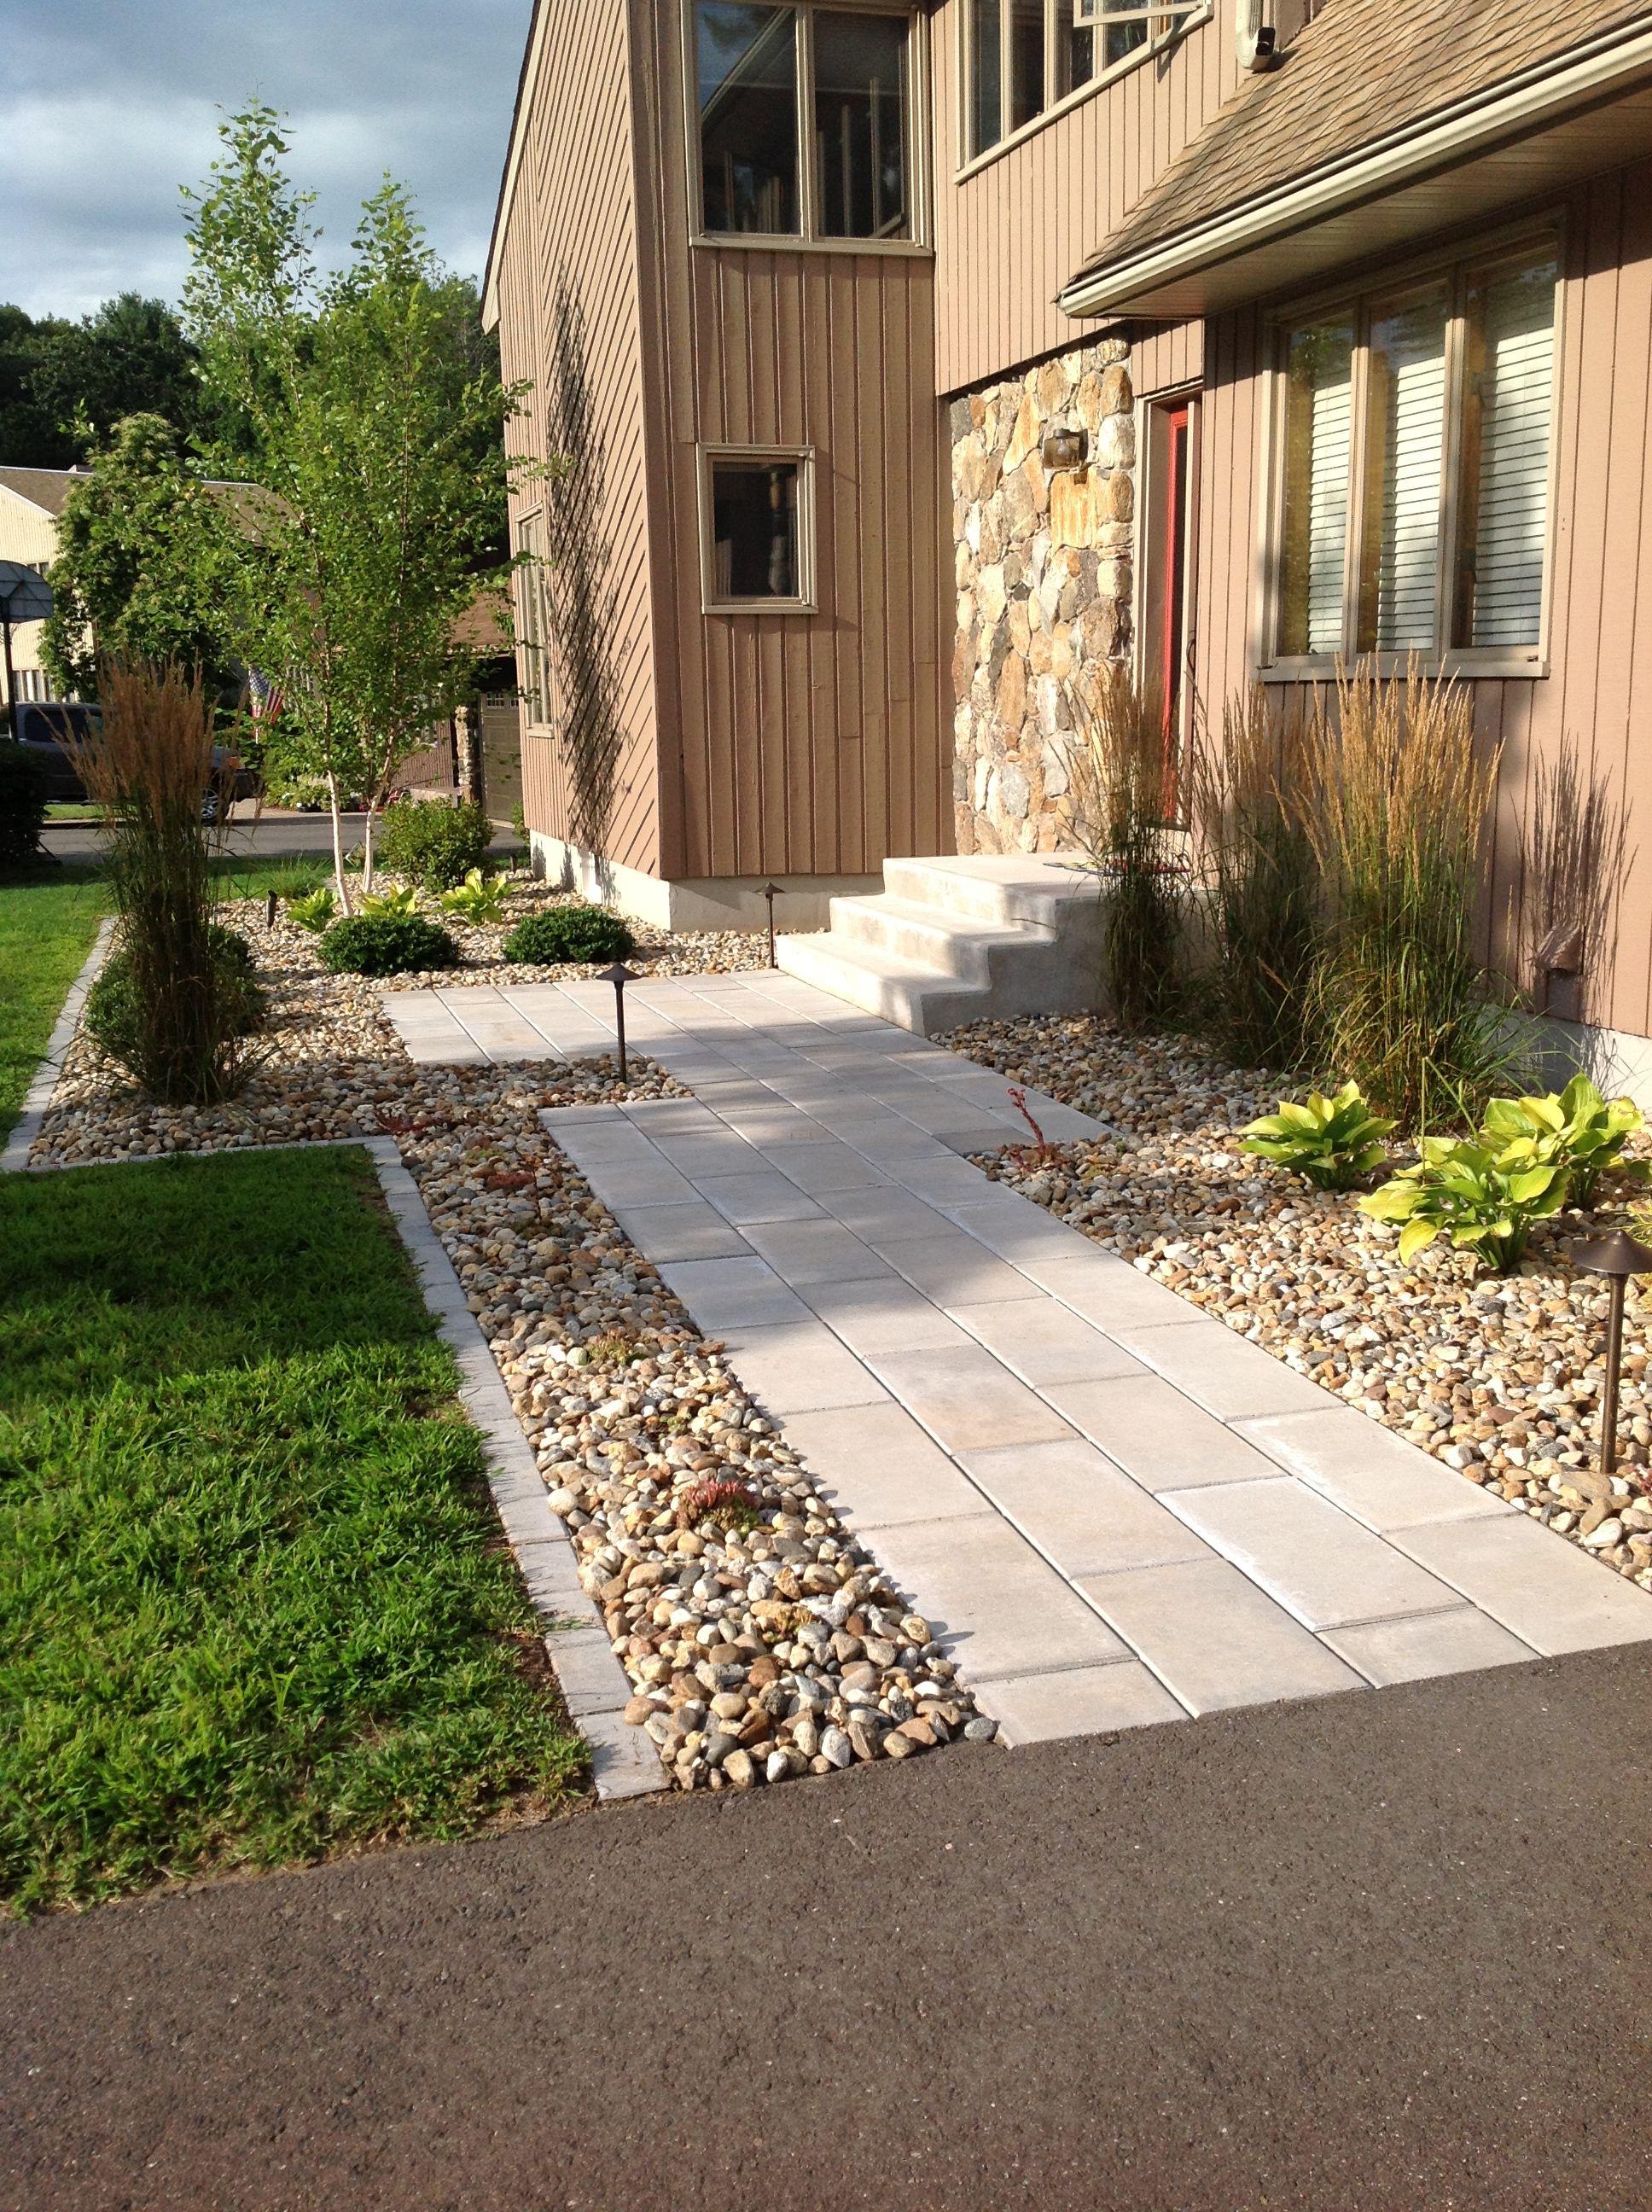 paver walkway with stone borders